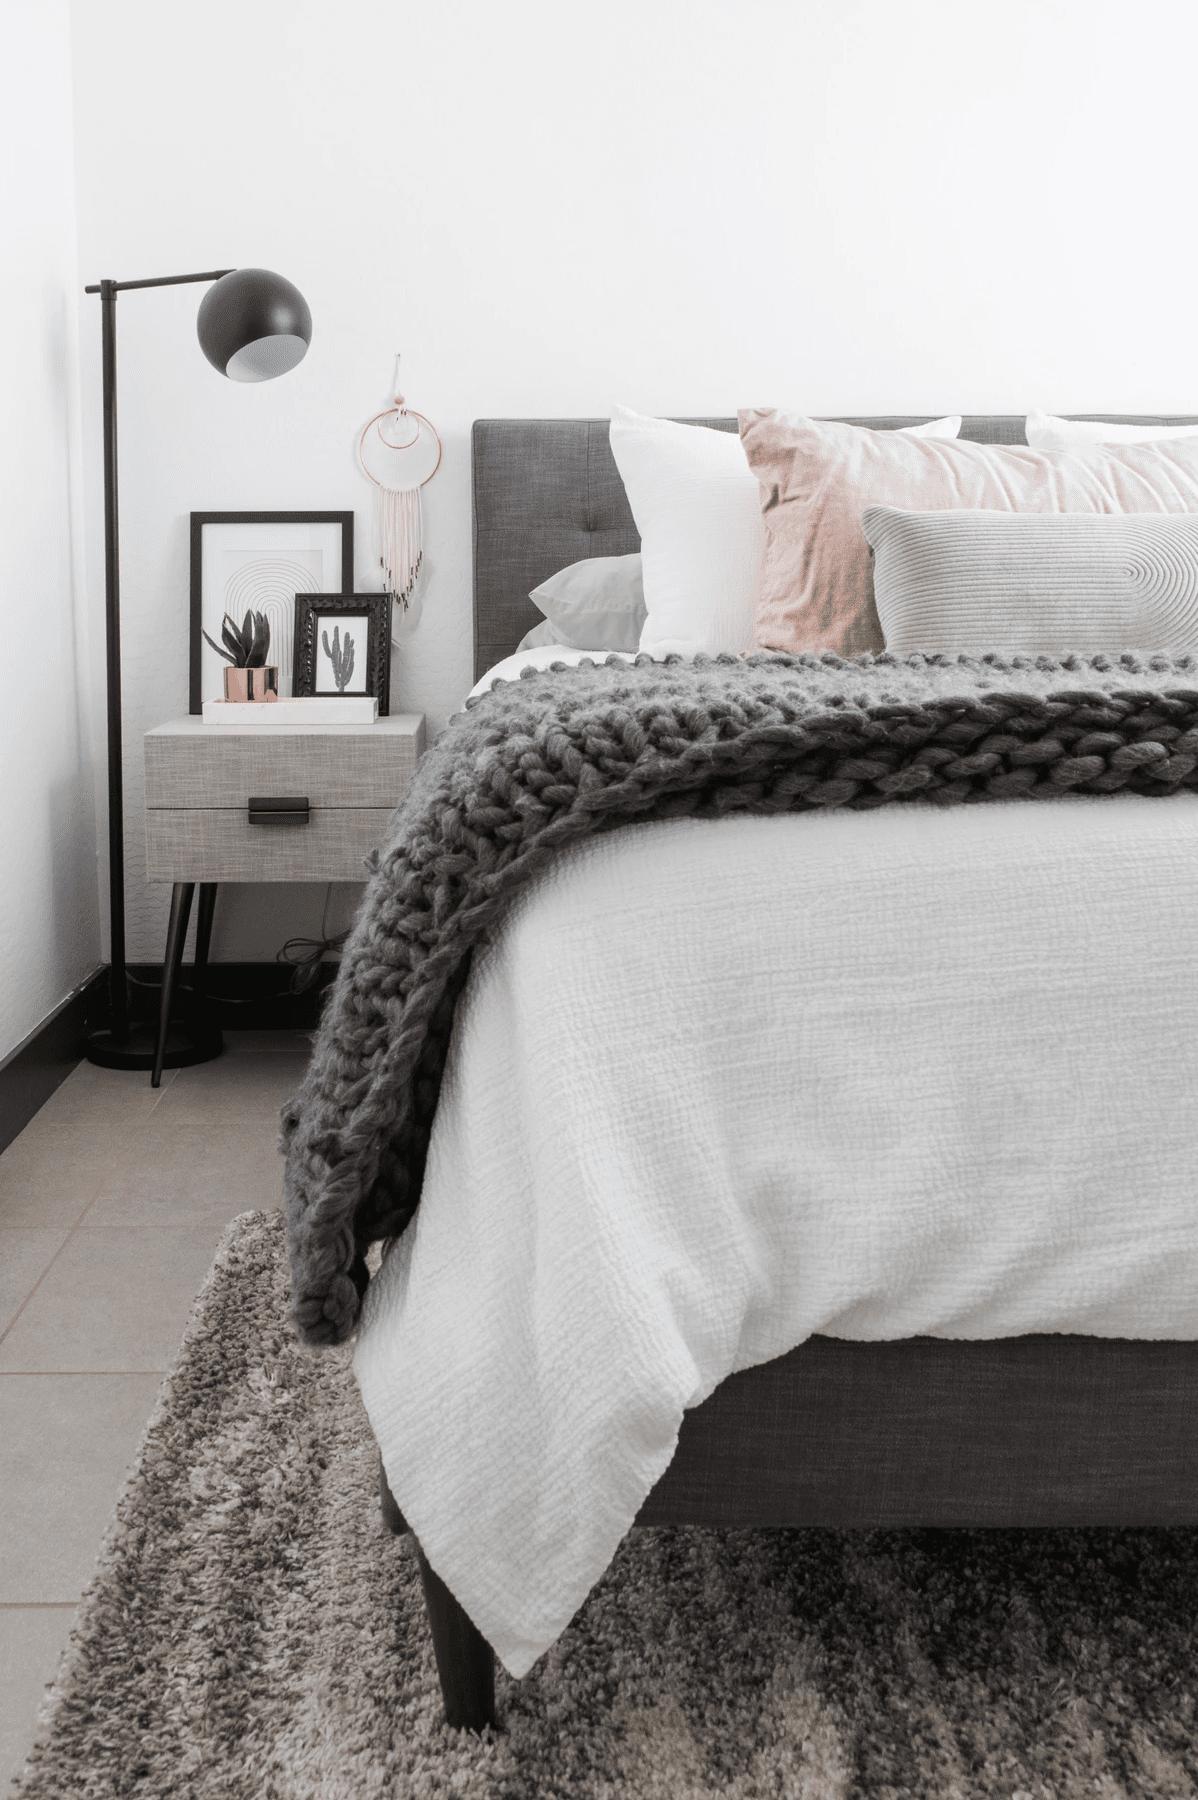 Monochrome bedroom with midcentury furniture.